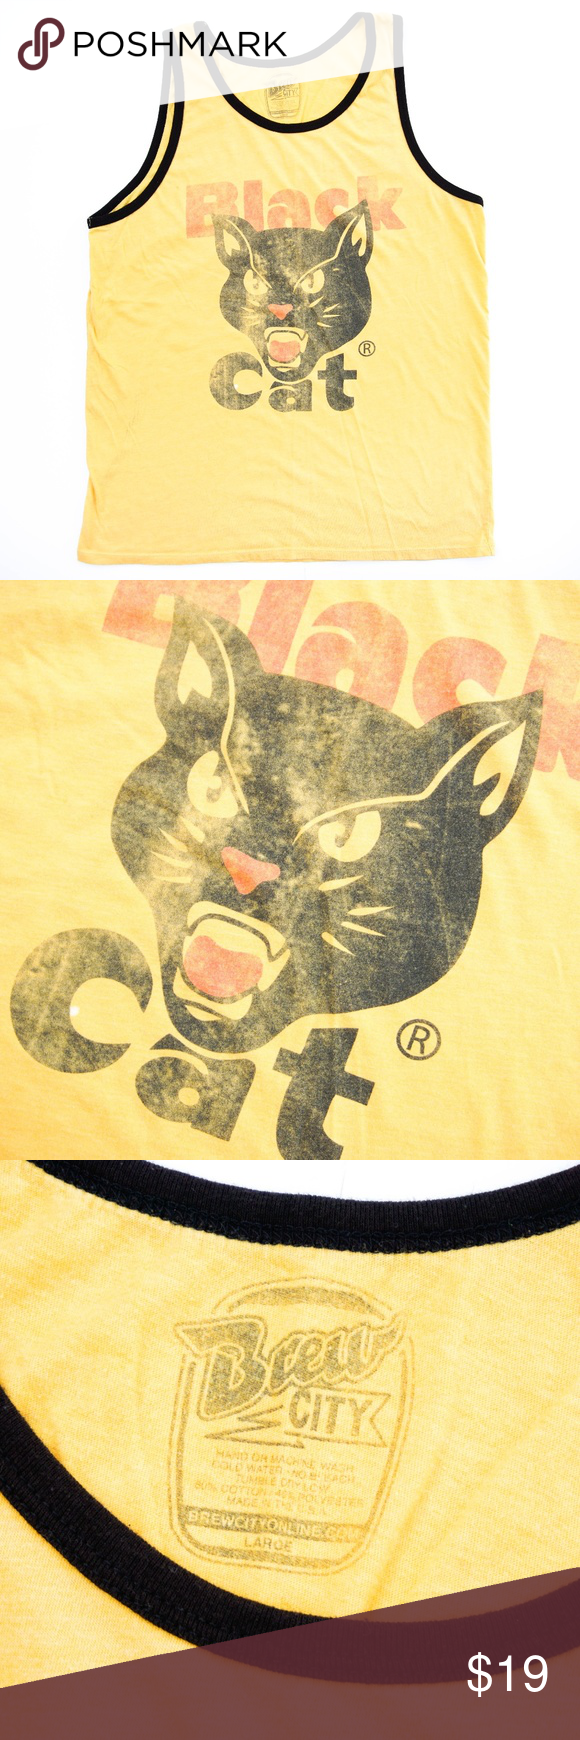 Rare Black Cat Fireworks Retro Style Tank Top L Retro